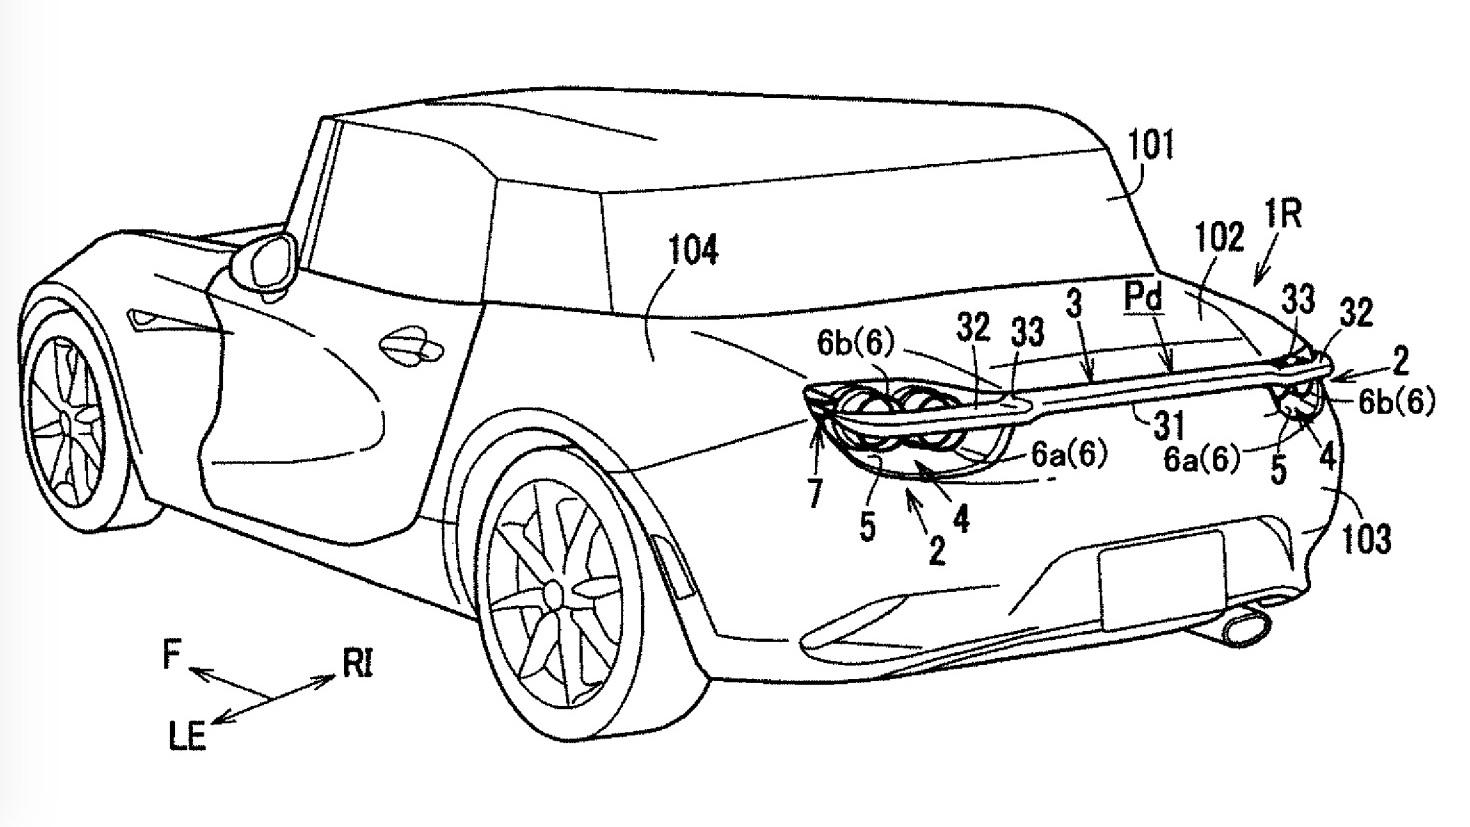 Mazda patent for active rear spoiler design